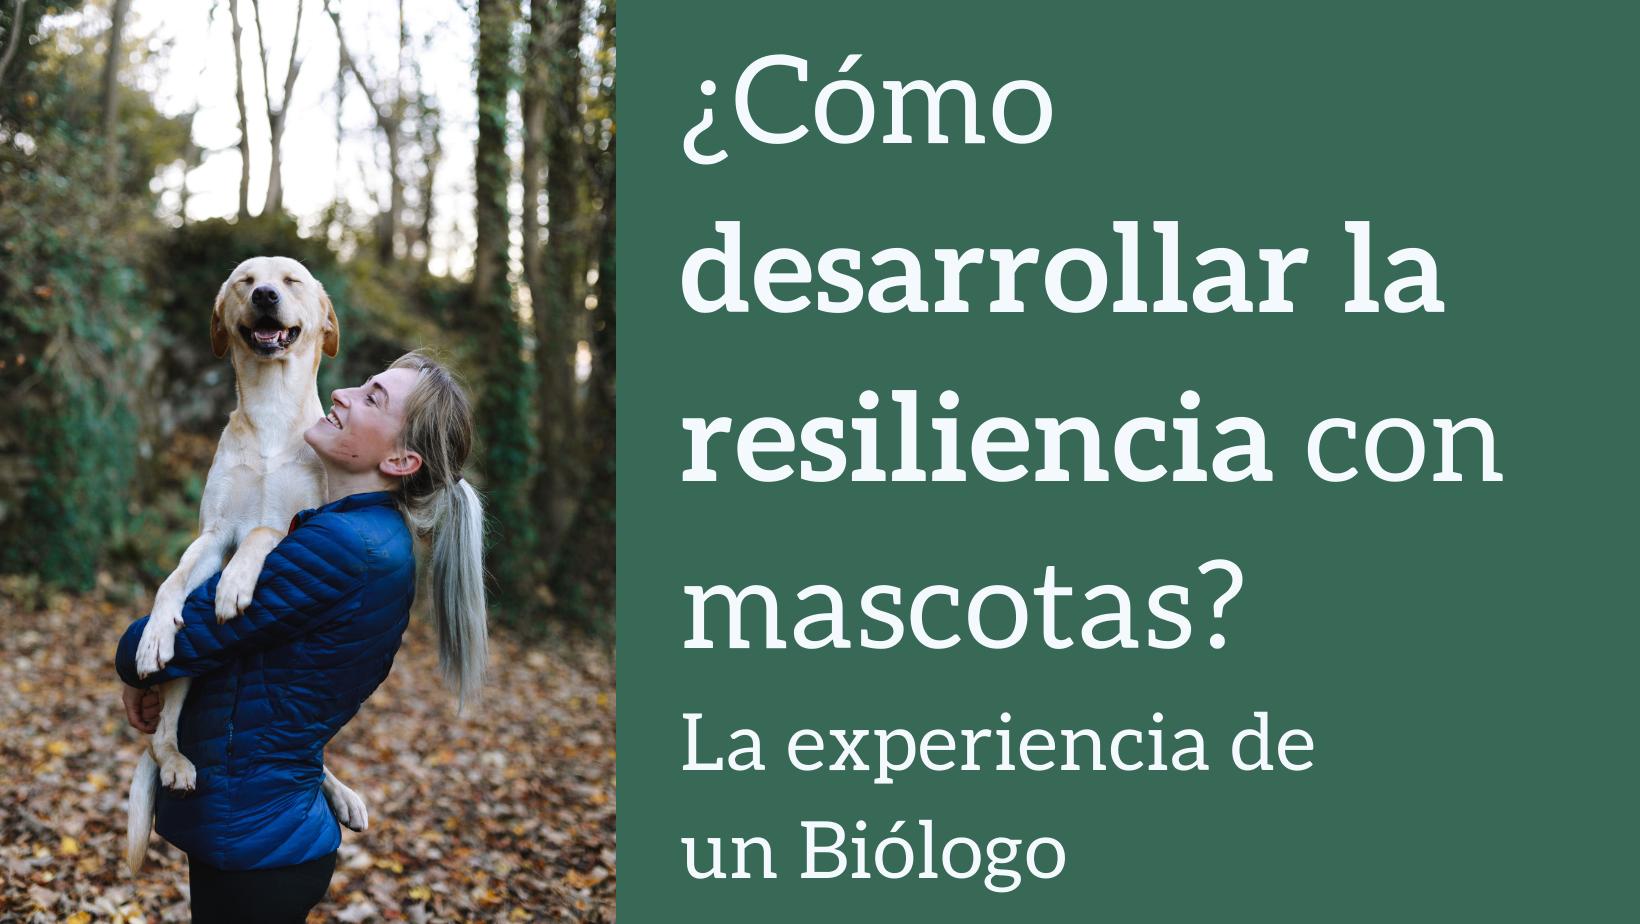 a98bf-como-desarrollar-resiliencia-mascotas-bweb.png